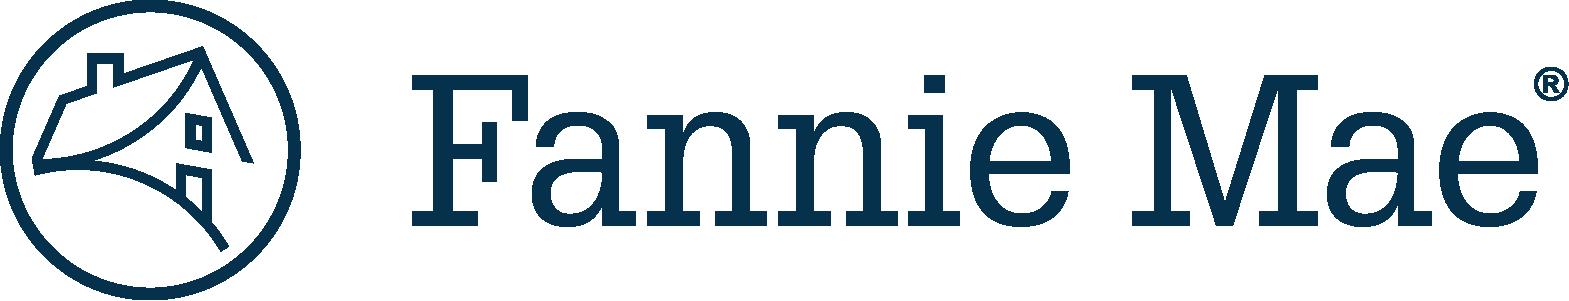 fm_logo_HEX_nvy_r